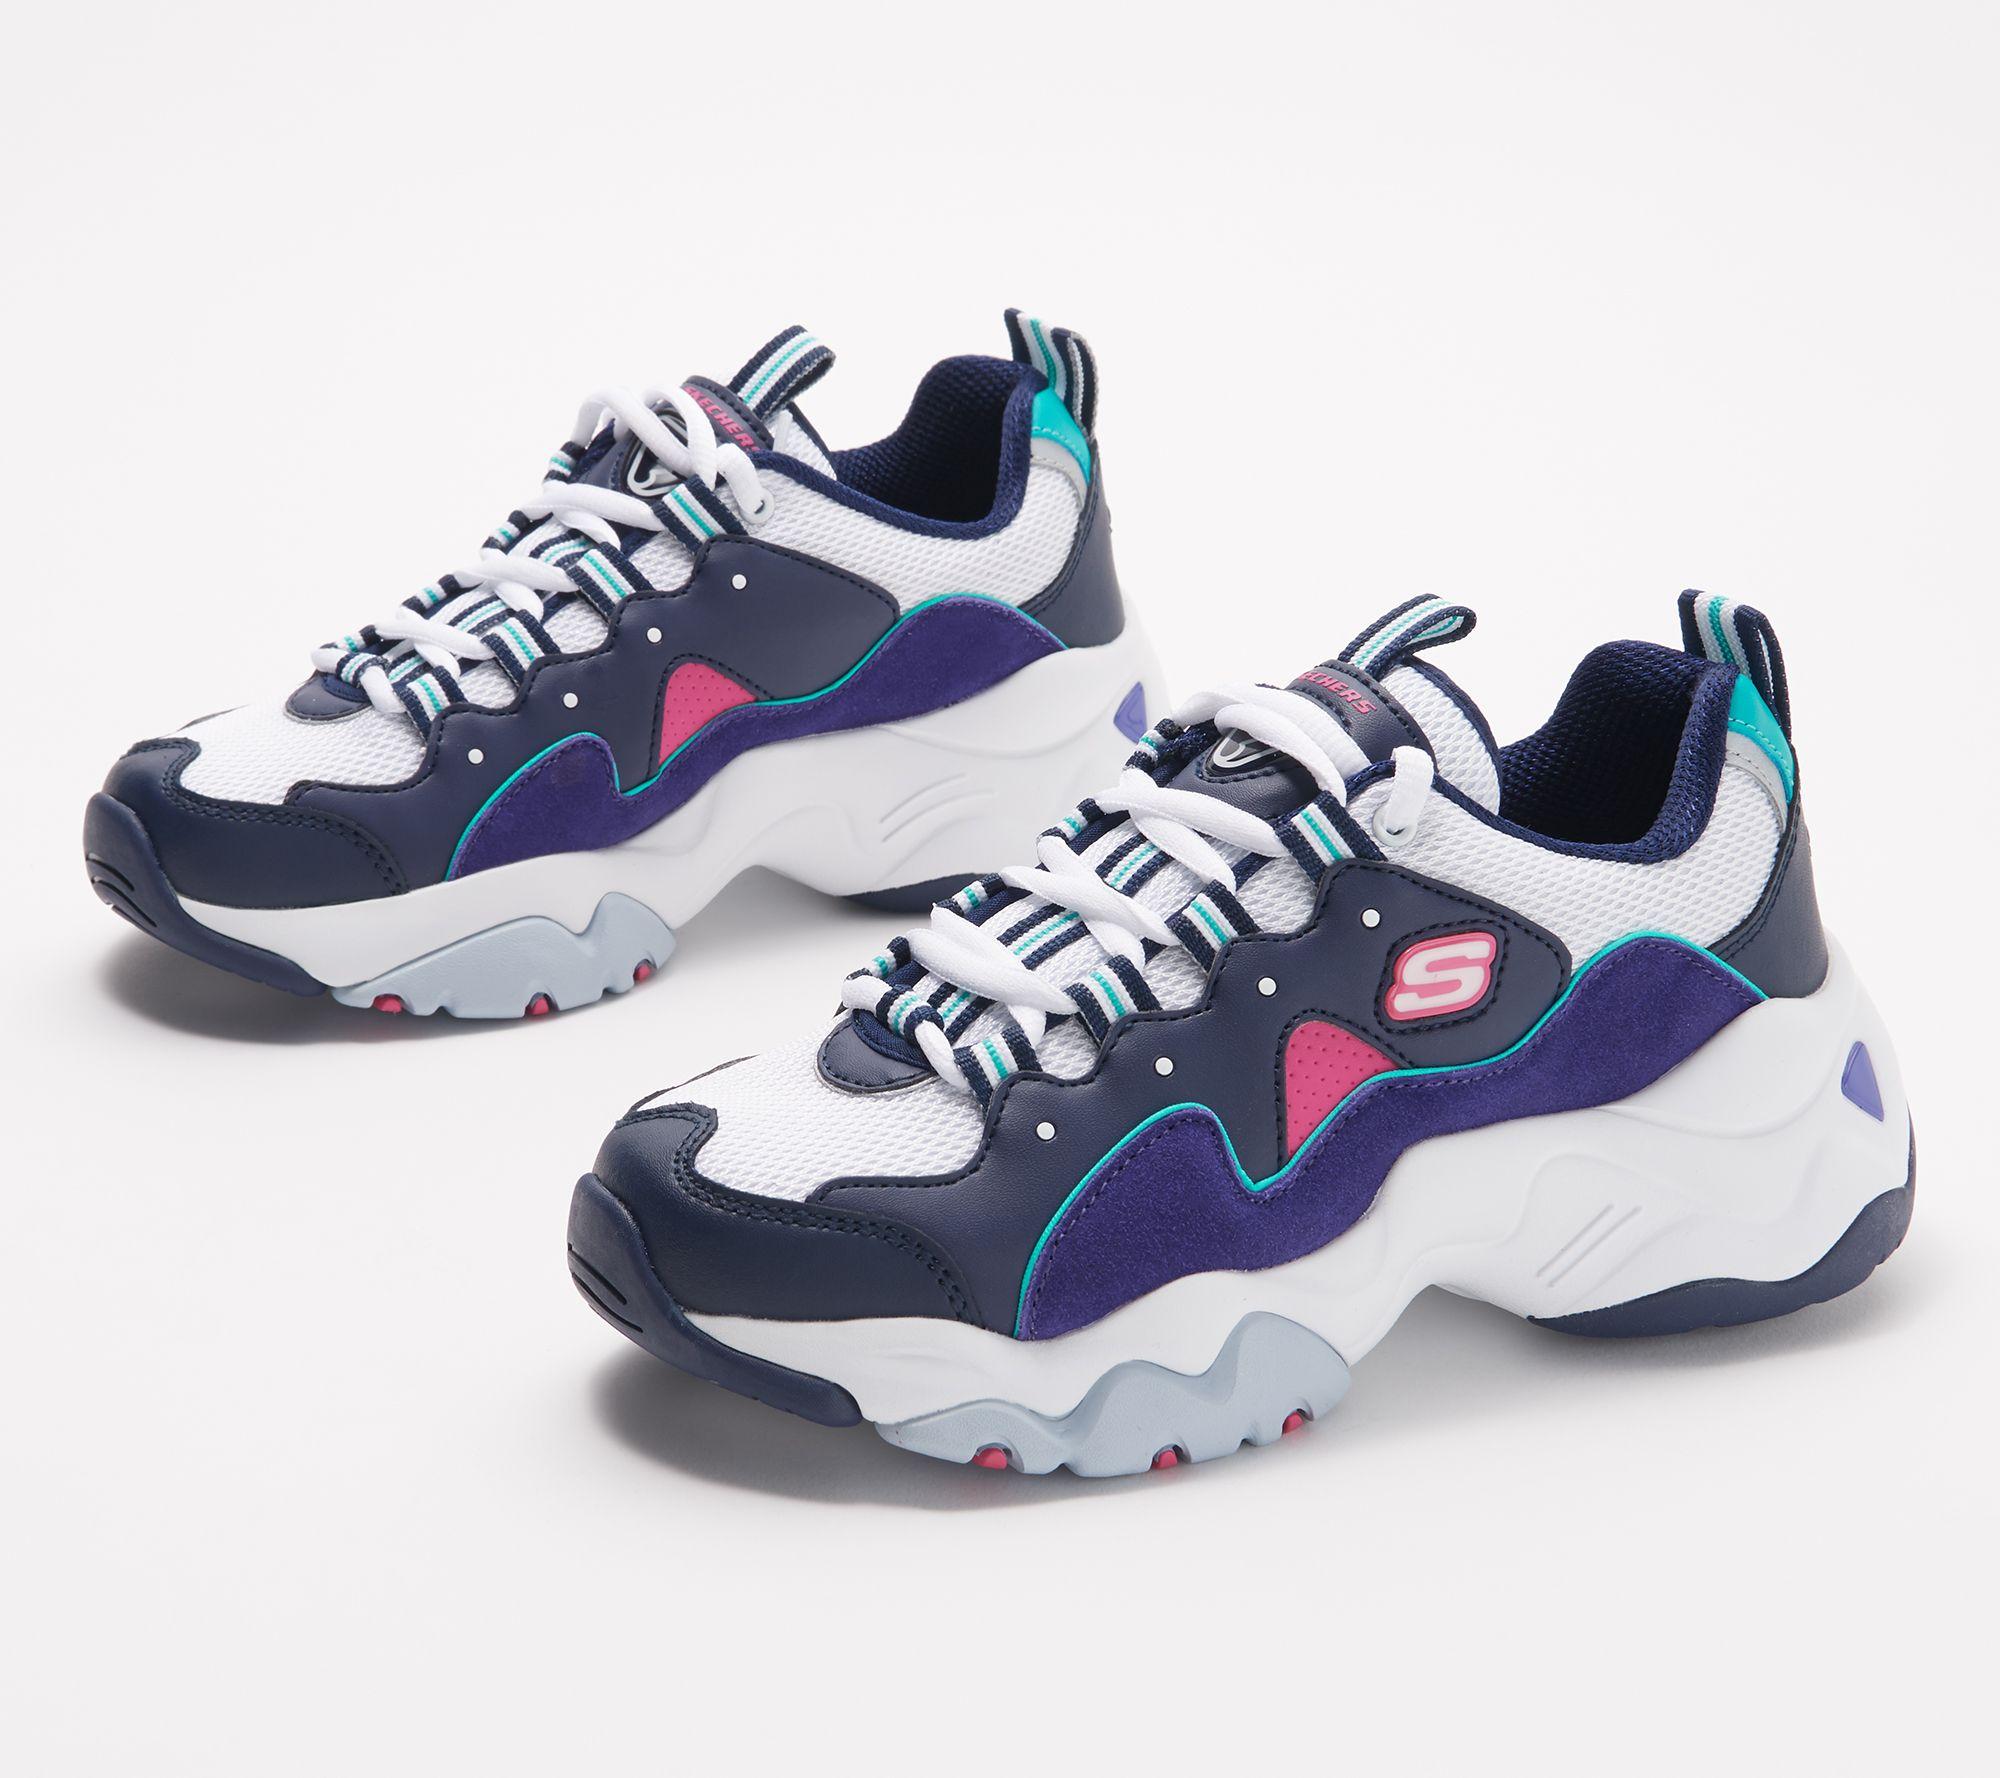 Skechers Skechers femmes's D'Lites Sneaker, WhiteBlue, 11 M US from Amazon | Martha Stewart